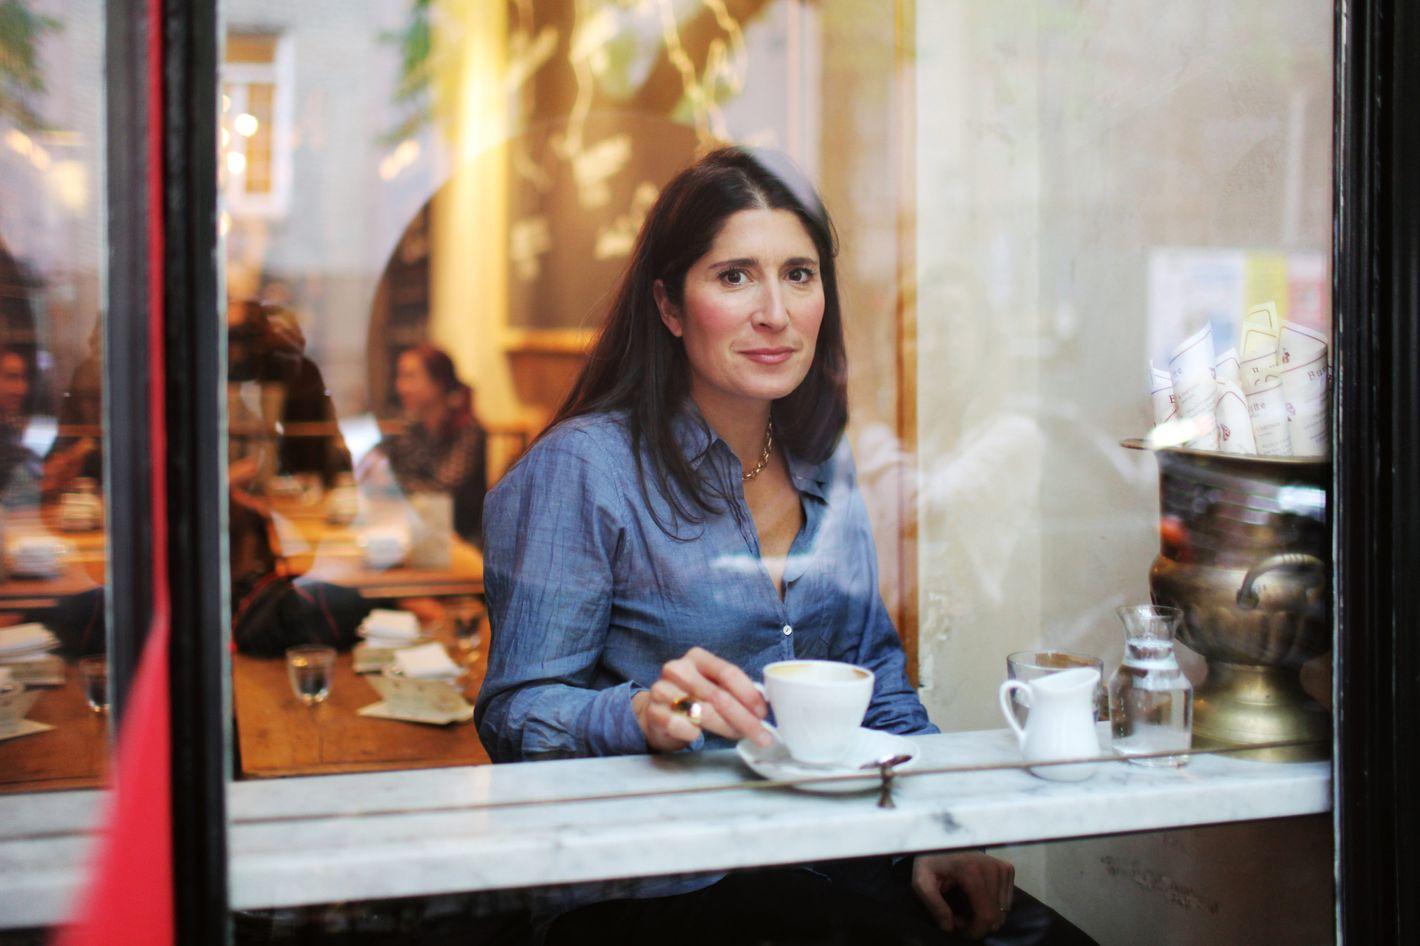 Guzmán at Buvette, one of her go-to restaurants.